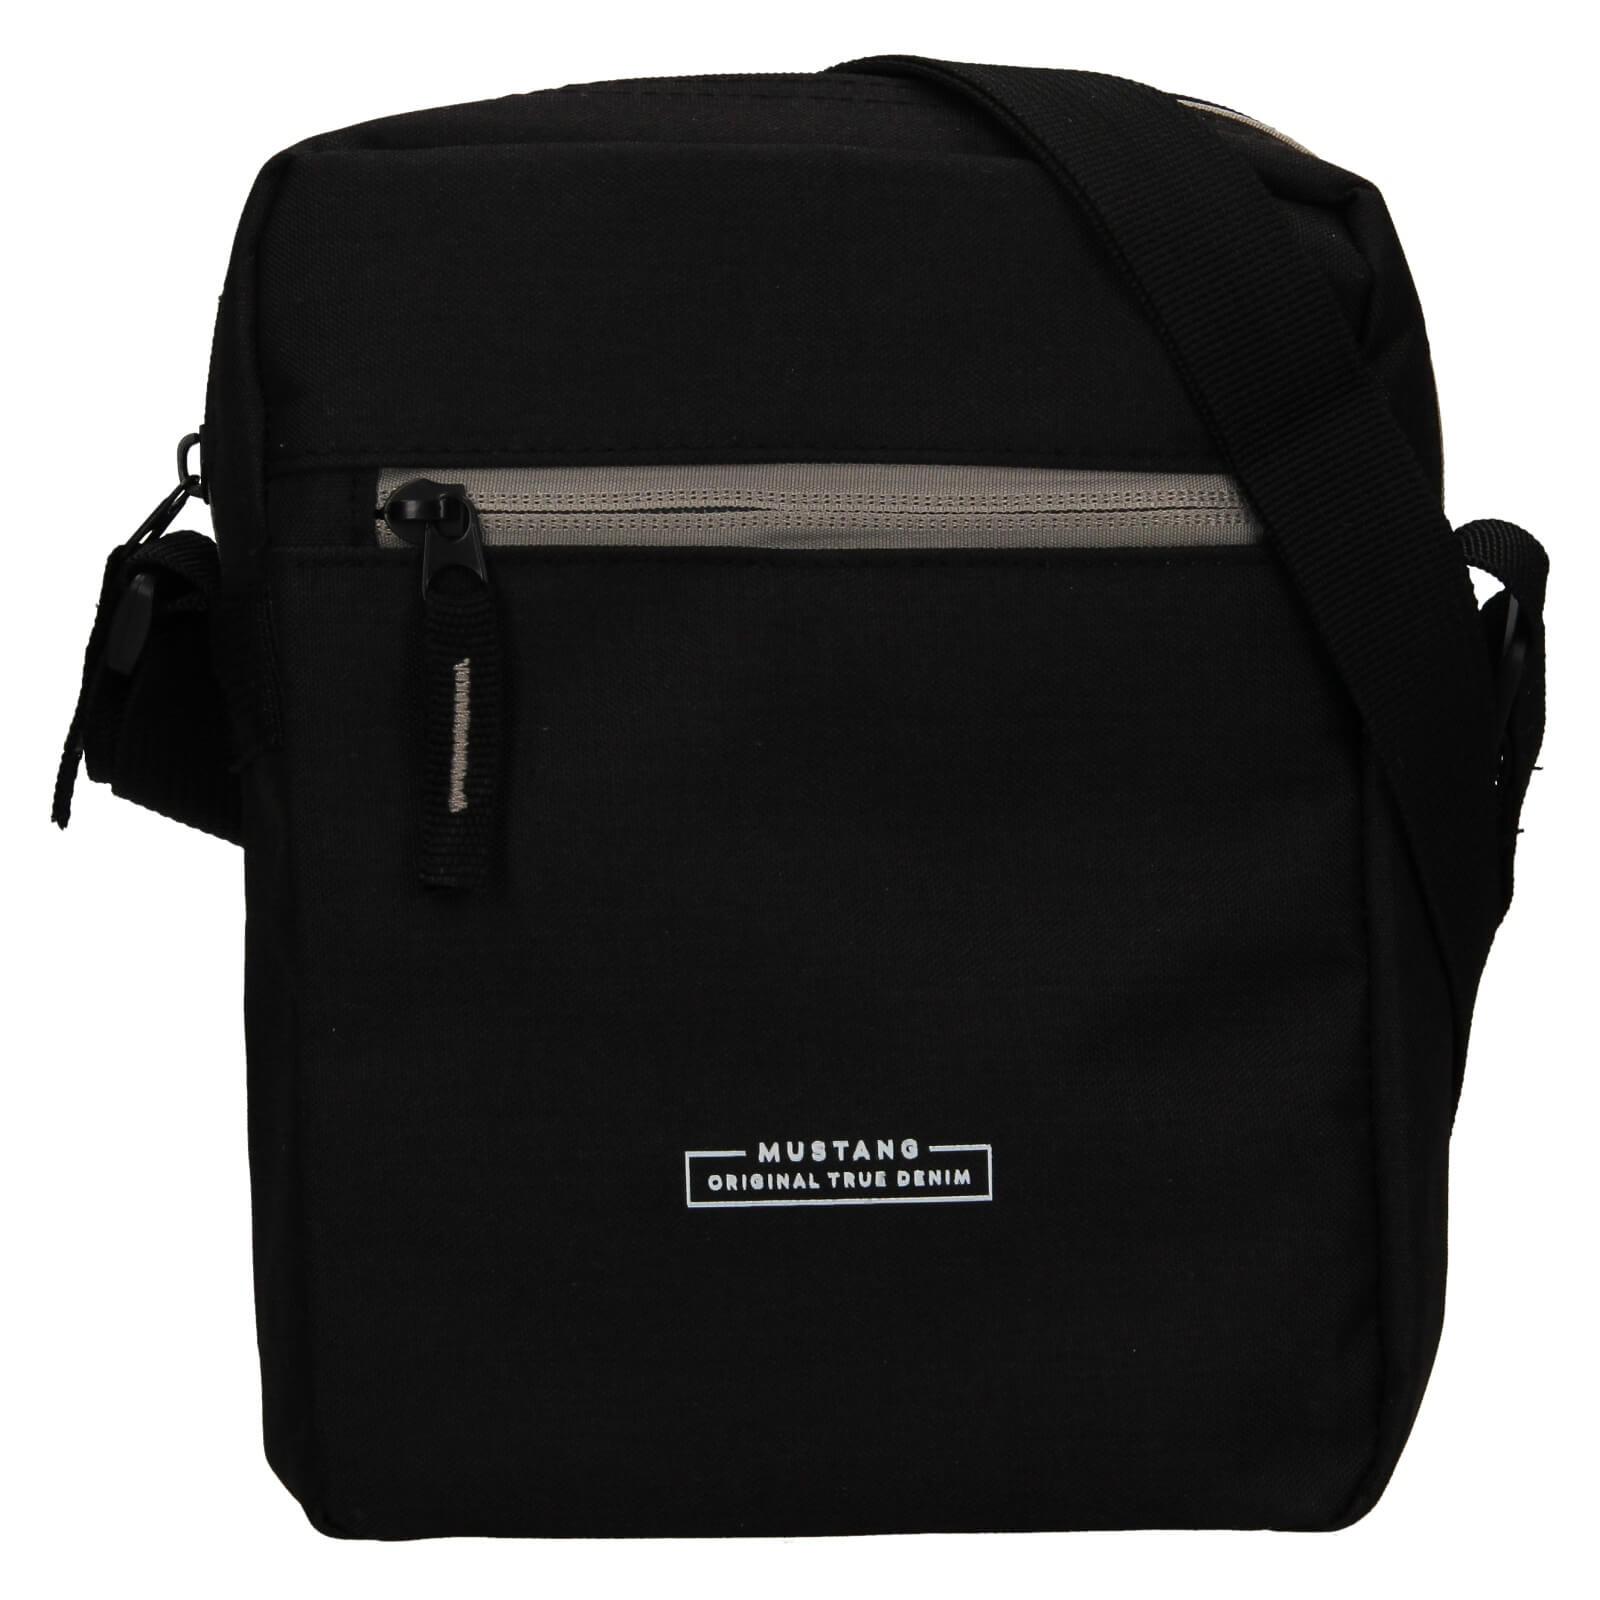 Pánska taška cez rameno Mustang Fabre - čierna